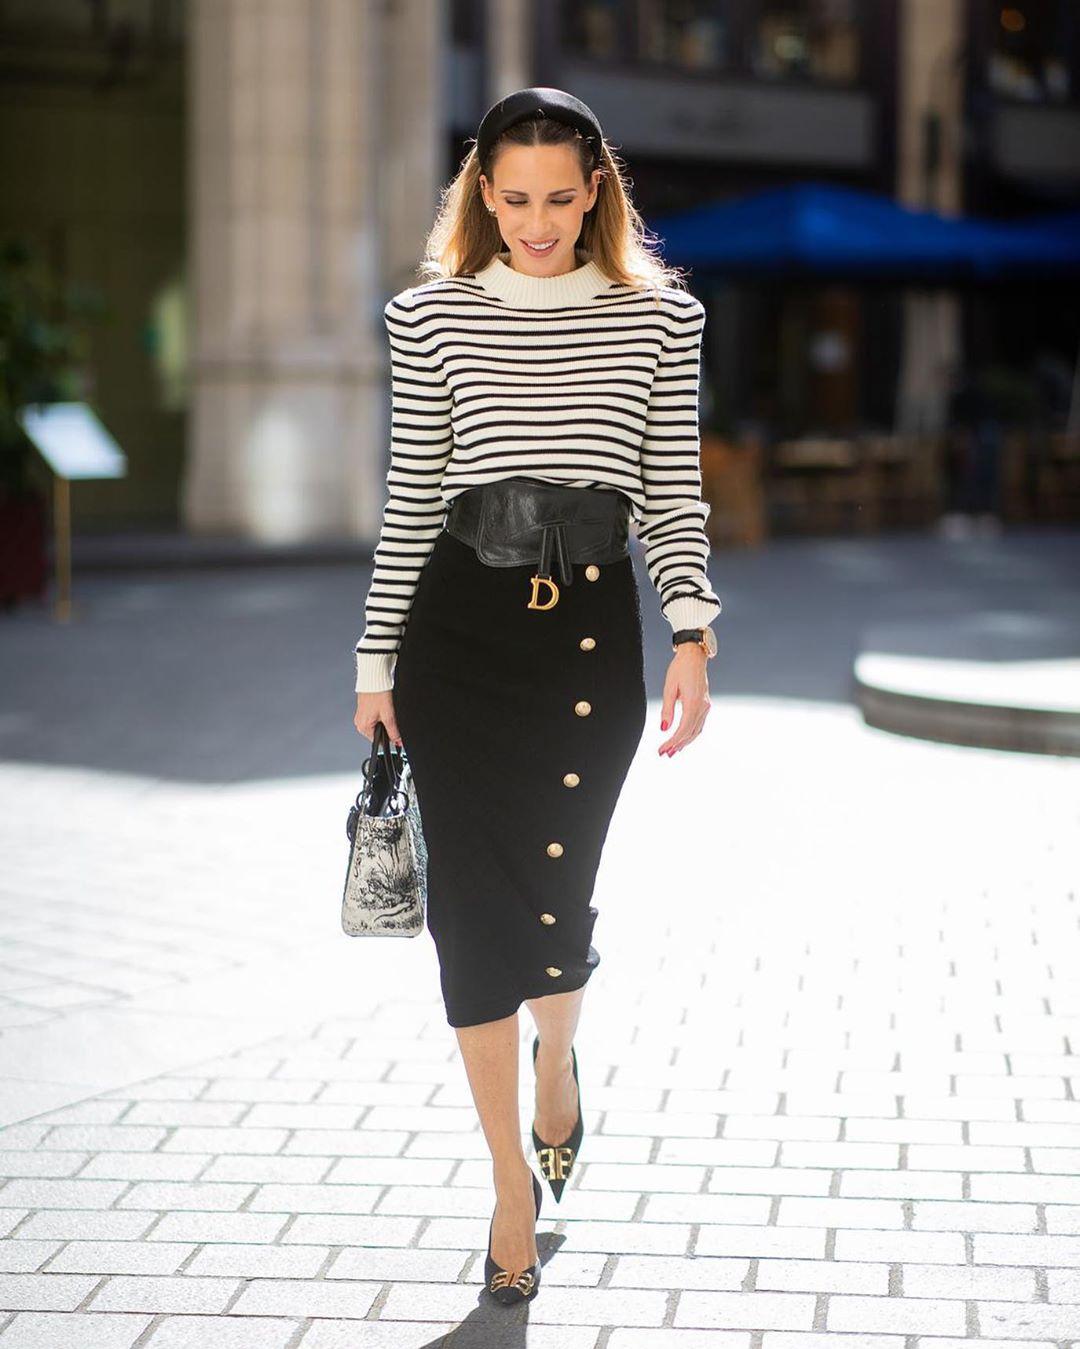 Модные юбки весна-лето 2020: фото 1